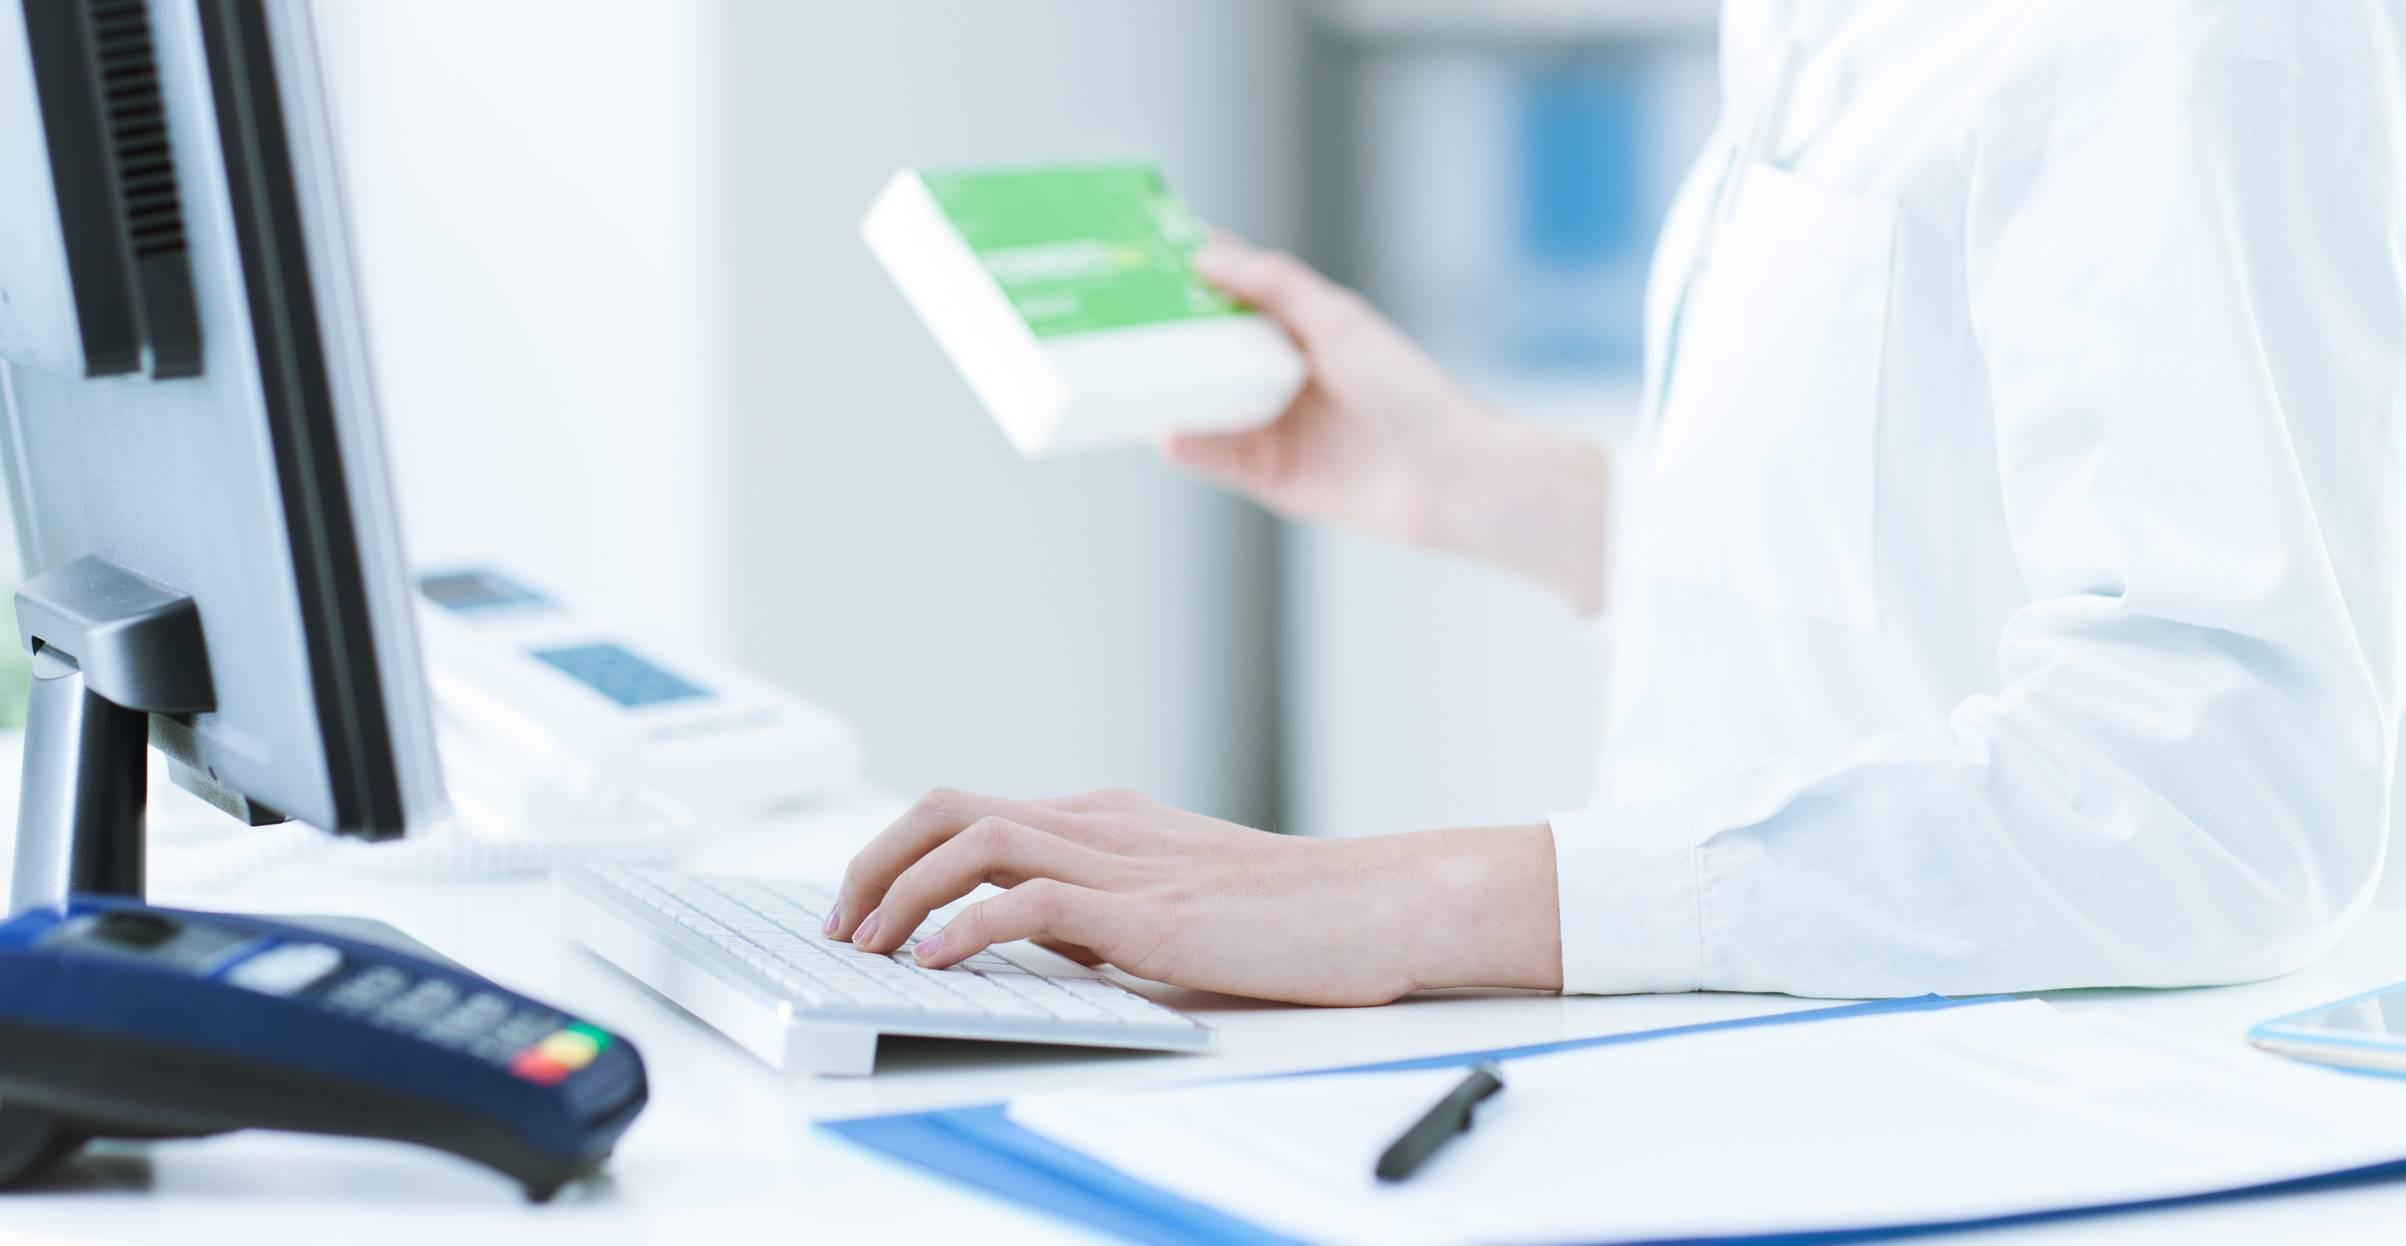 pharmacie gestion Tiers Payant